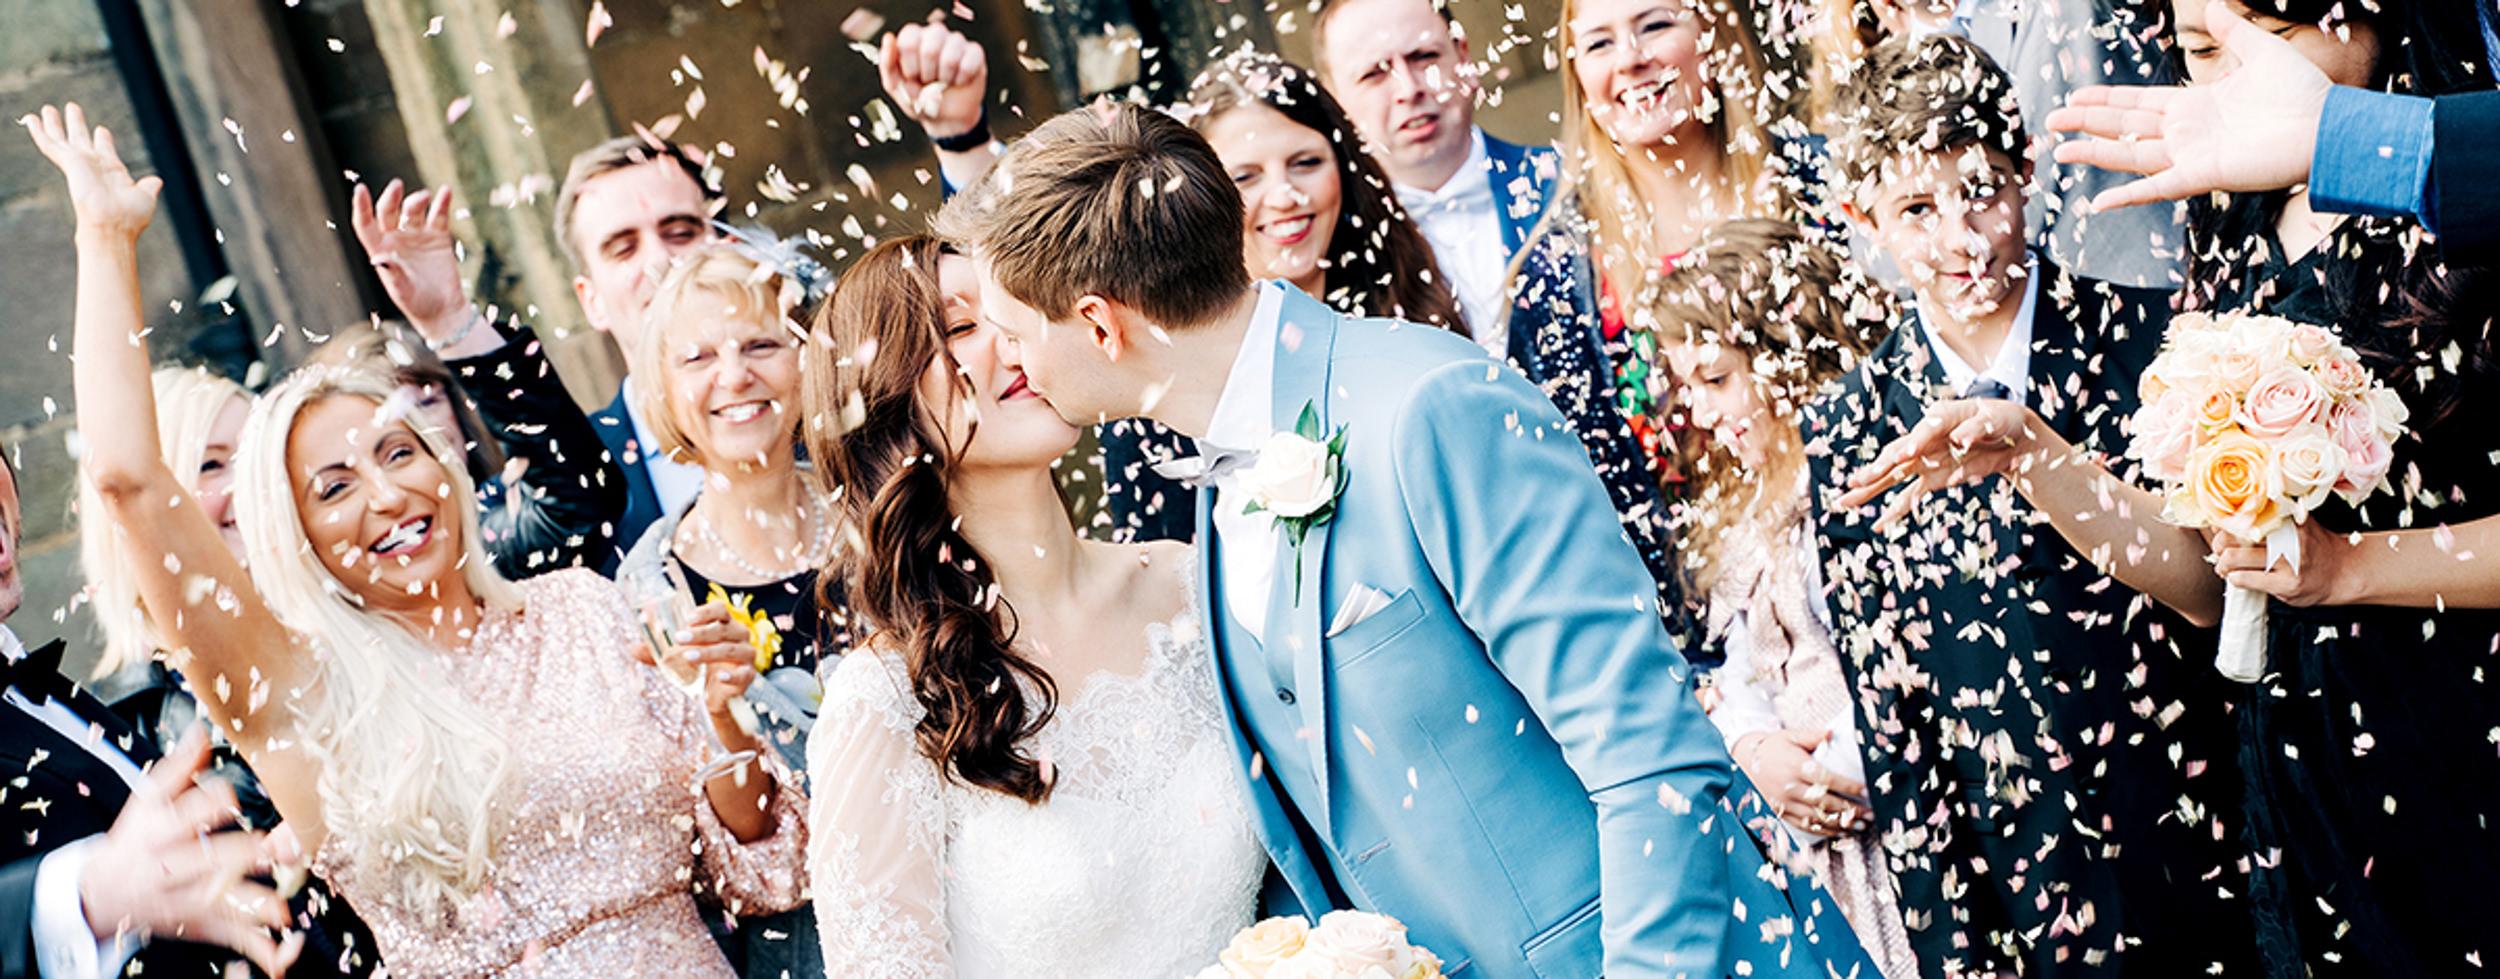 East-Yorkshire-Wedding-Photographer-The-Barns-Weddings-Goole-Hull-Abraham-Photography-04